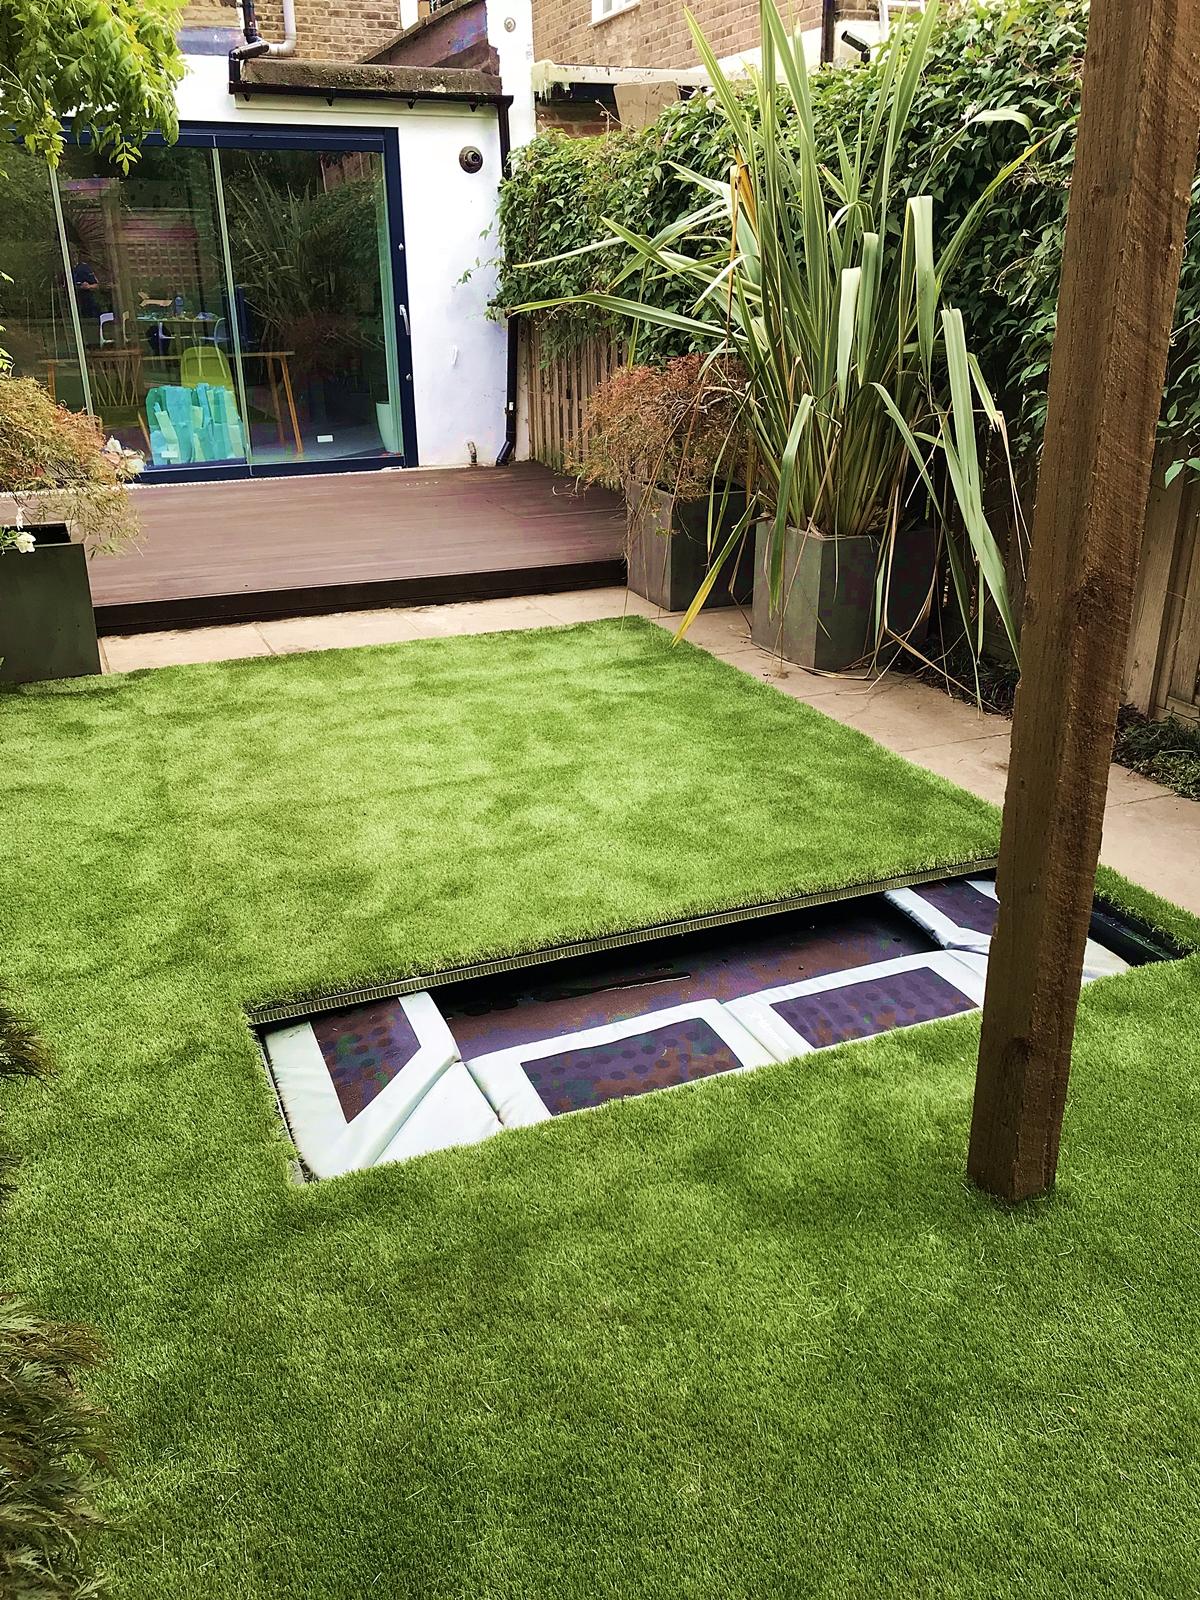 Garden Walk London: Sunken Garden Trampoline With Walk On Lid Cover